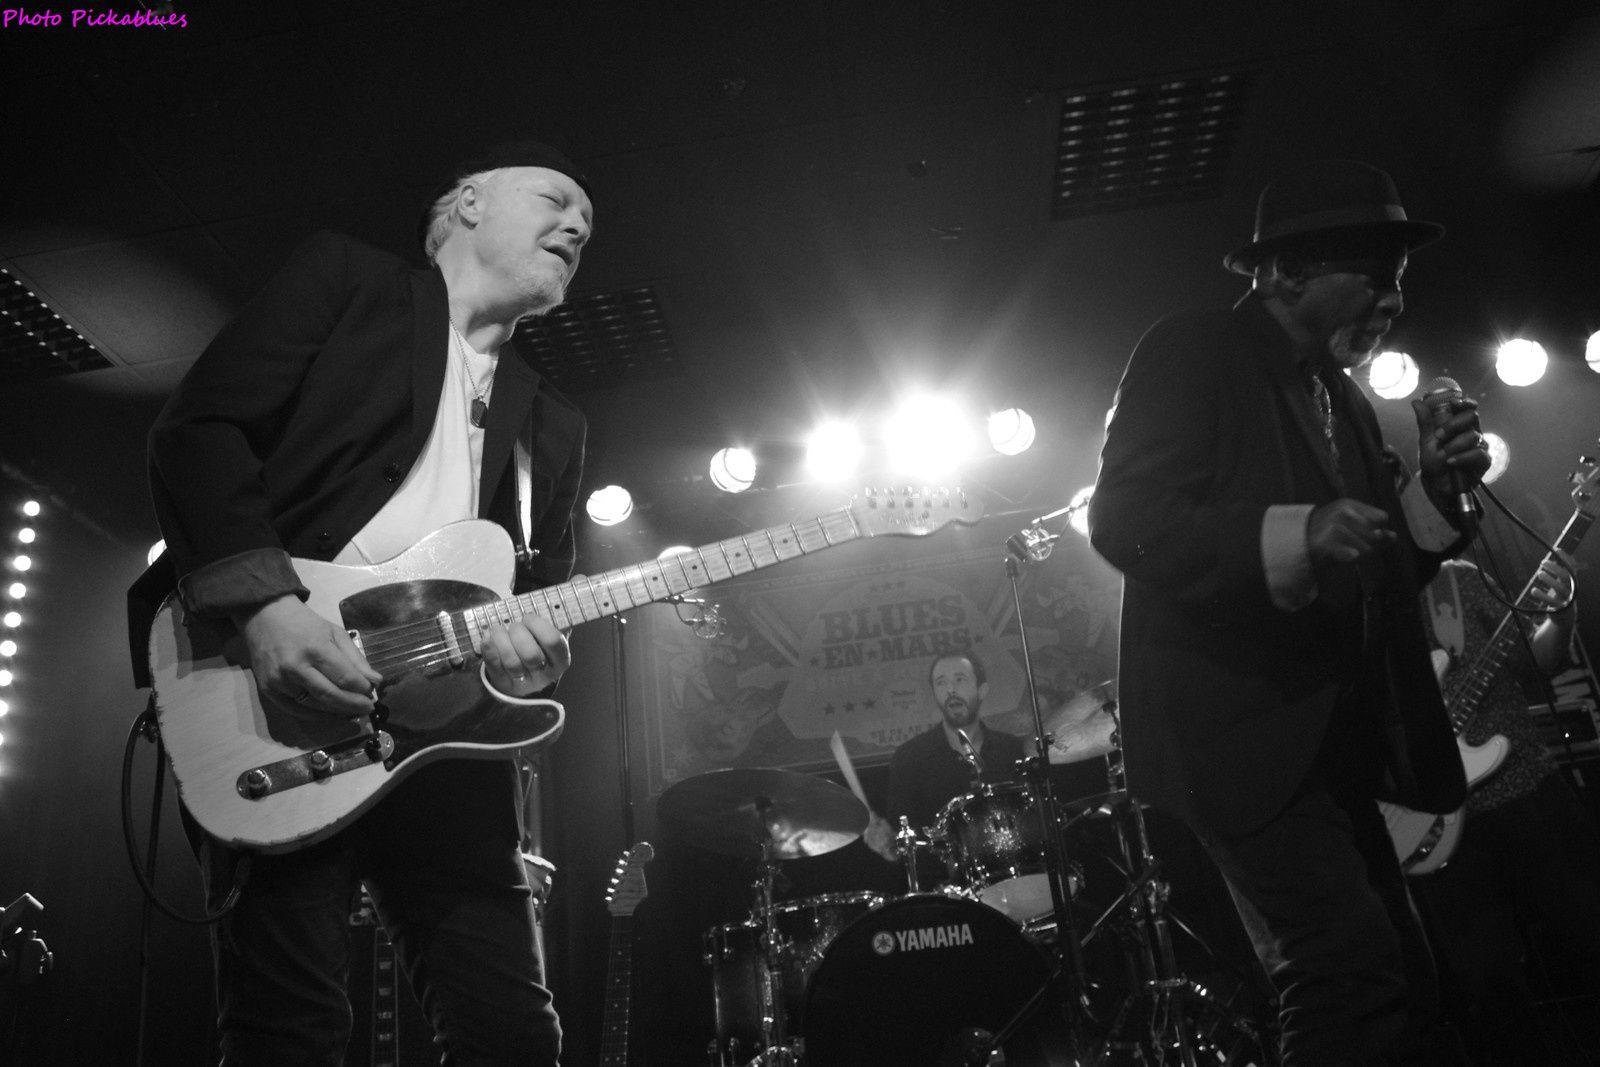 Fred Chapellier & The Gents, feat. Dale Blade - 24/03/2018 - La Boite à Musiques, Wattrelos (59)